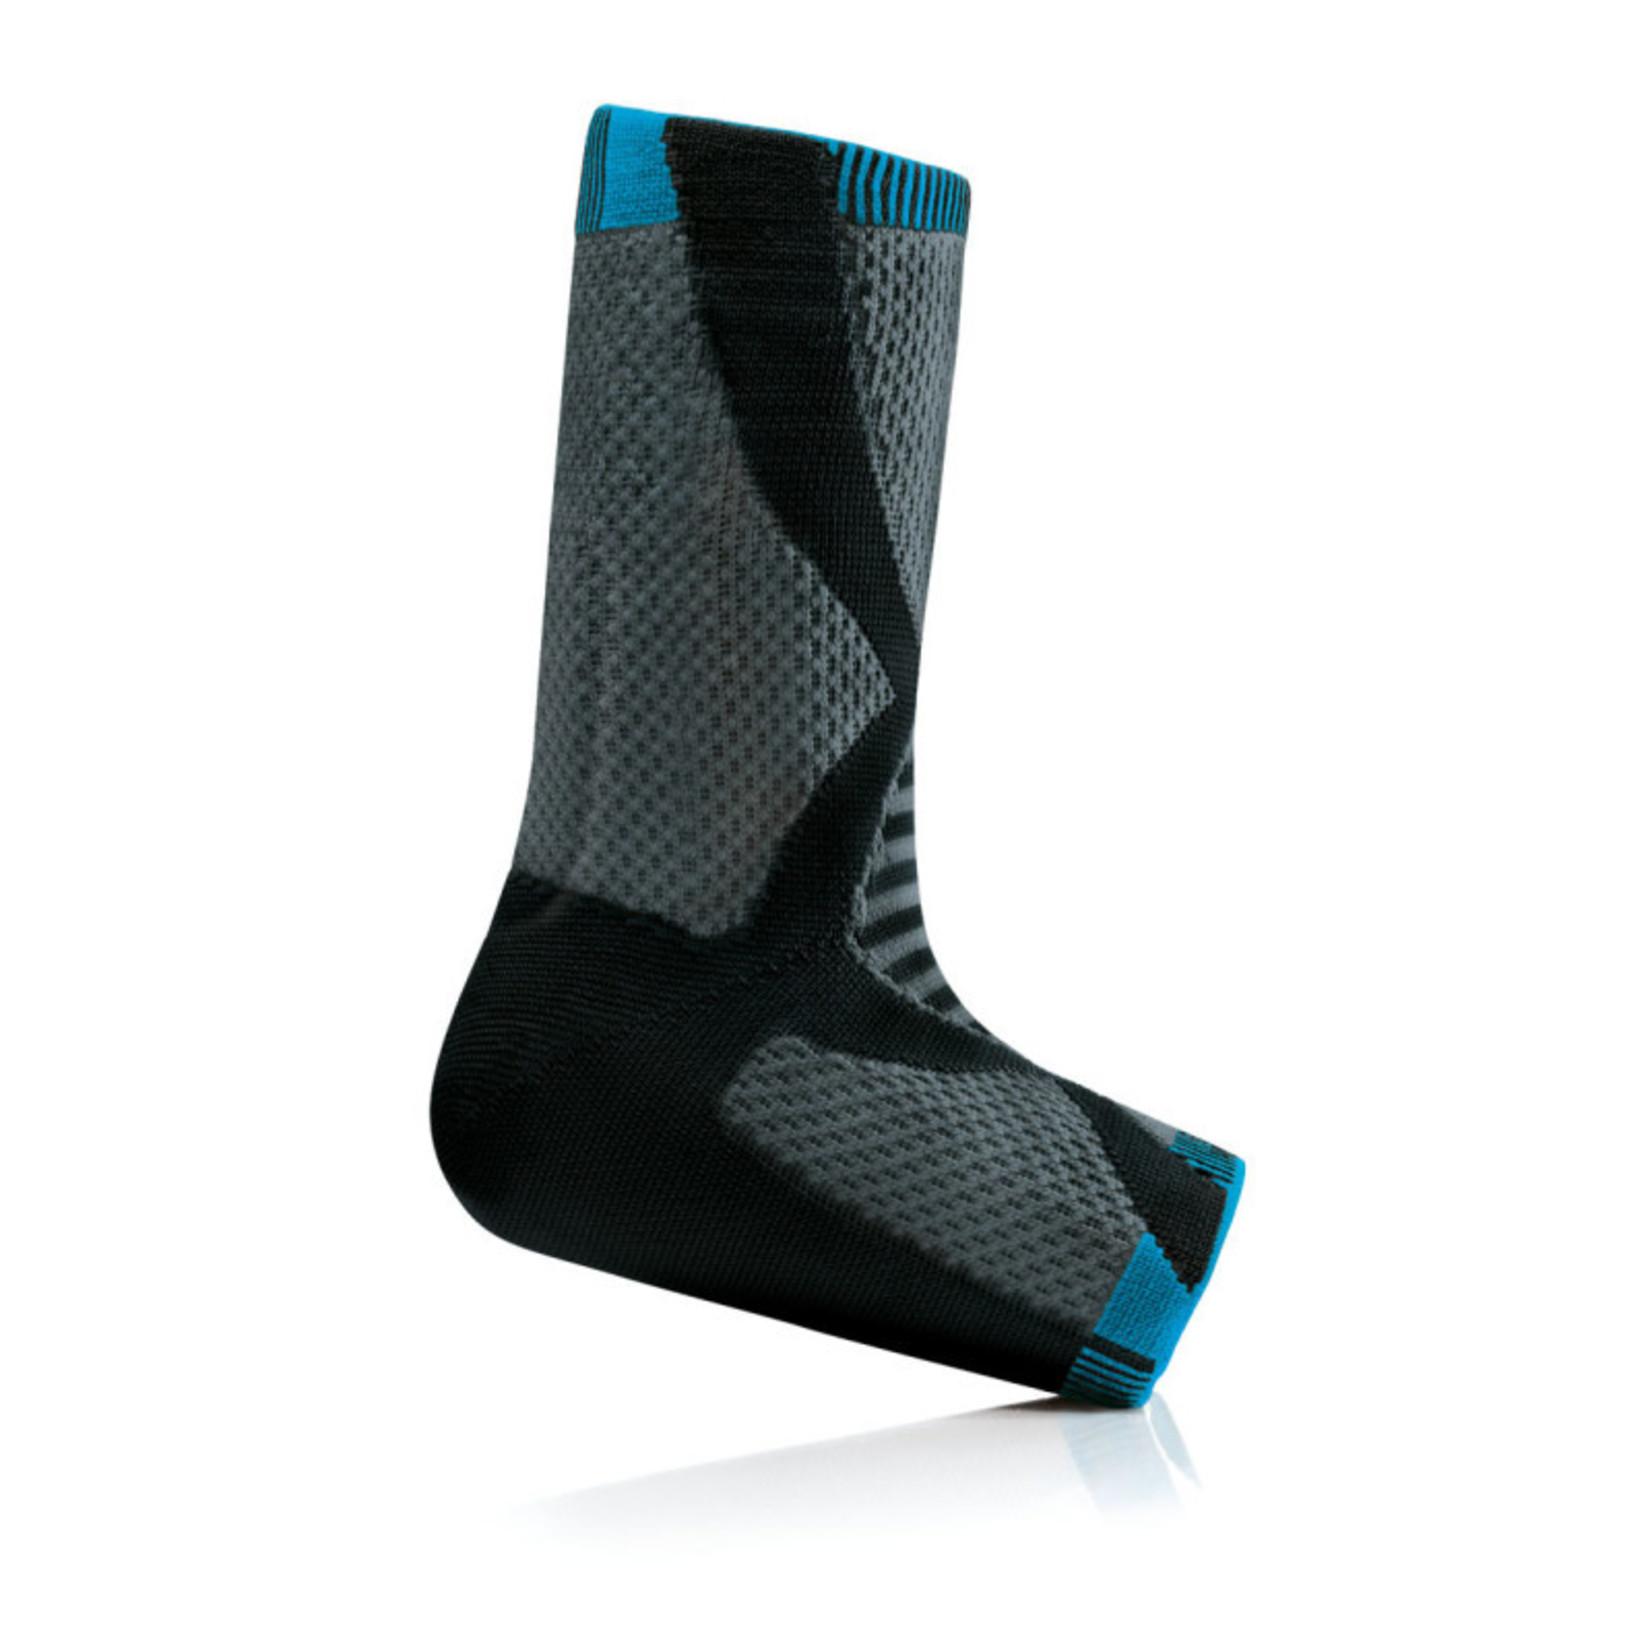 FLA Orthopedics PROLITE 3D ACHILLES TENDON SUPPORT CHARCOAL